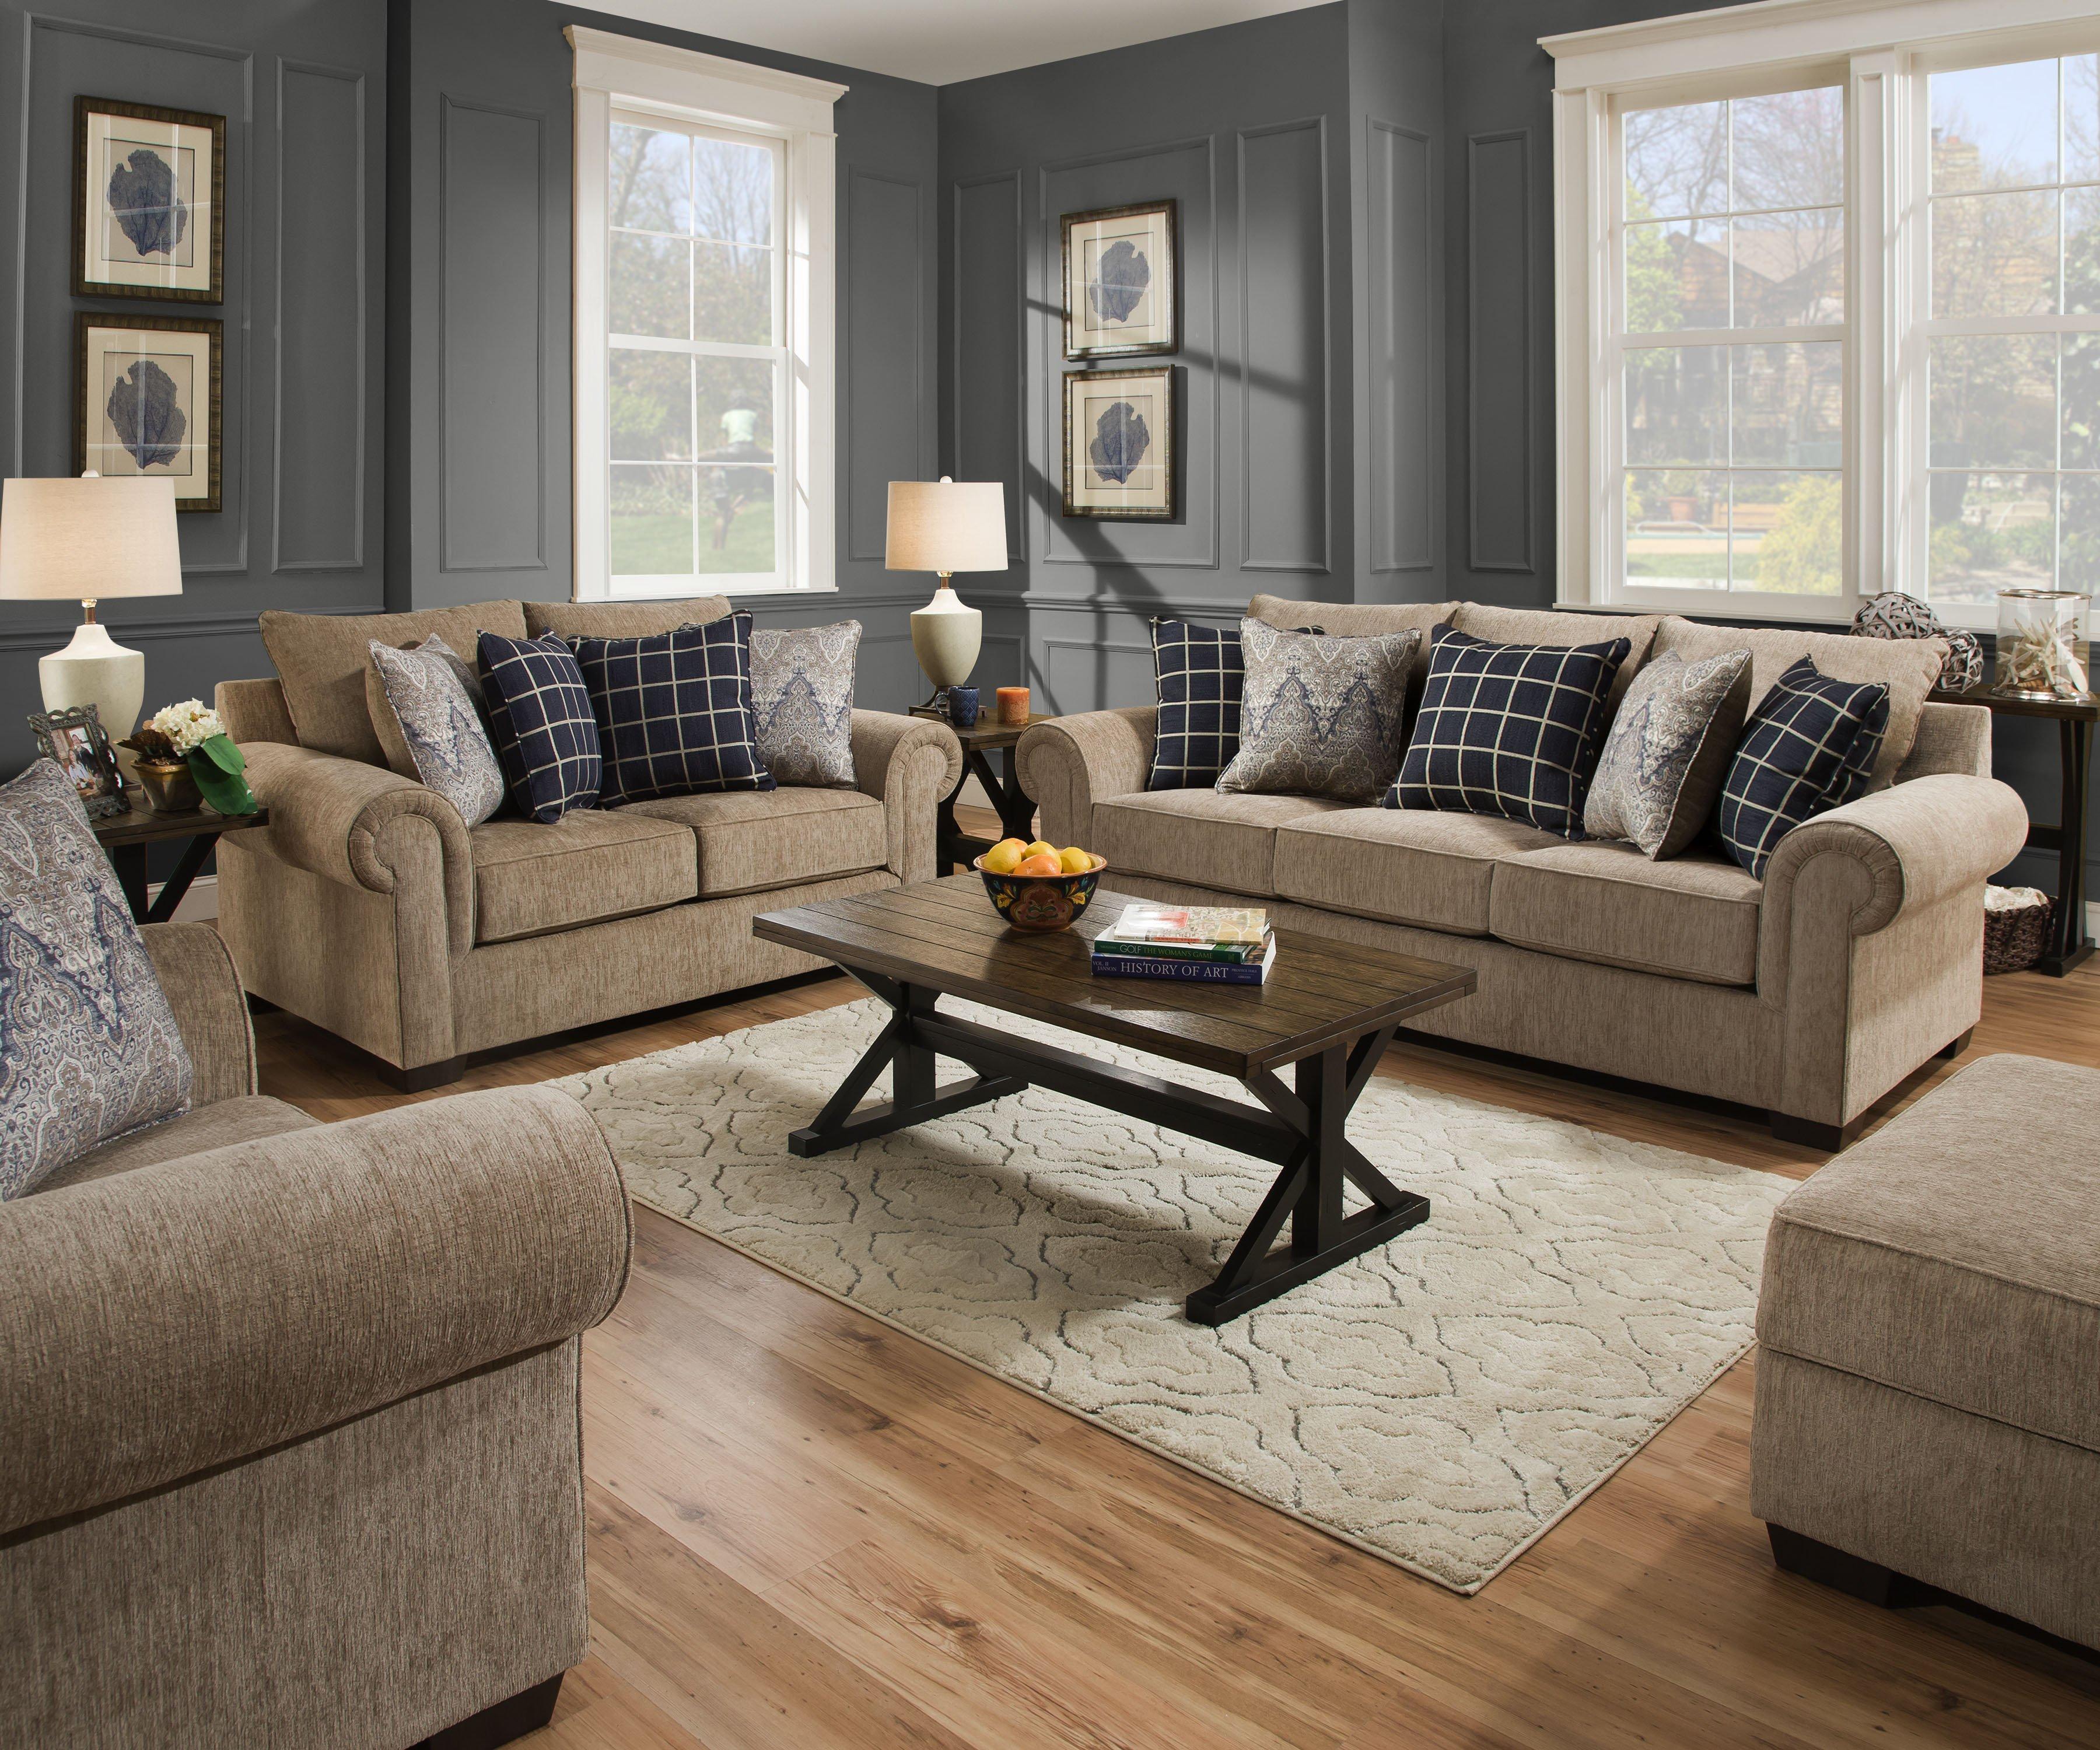 7592 Beautyrest Sofa and Love in Gavin Mushroom $959